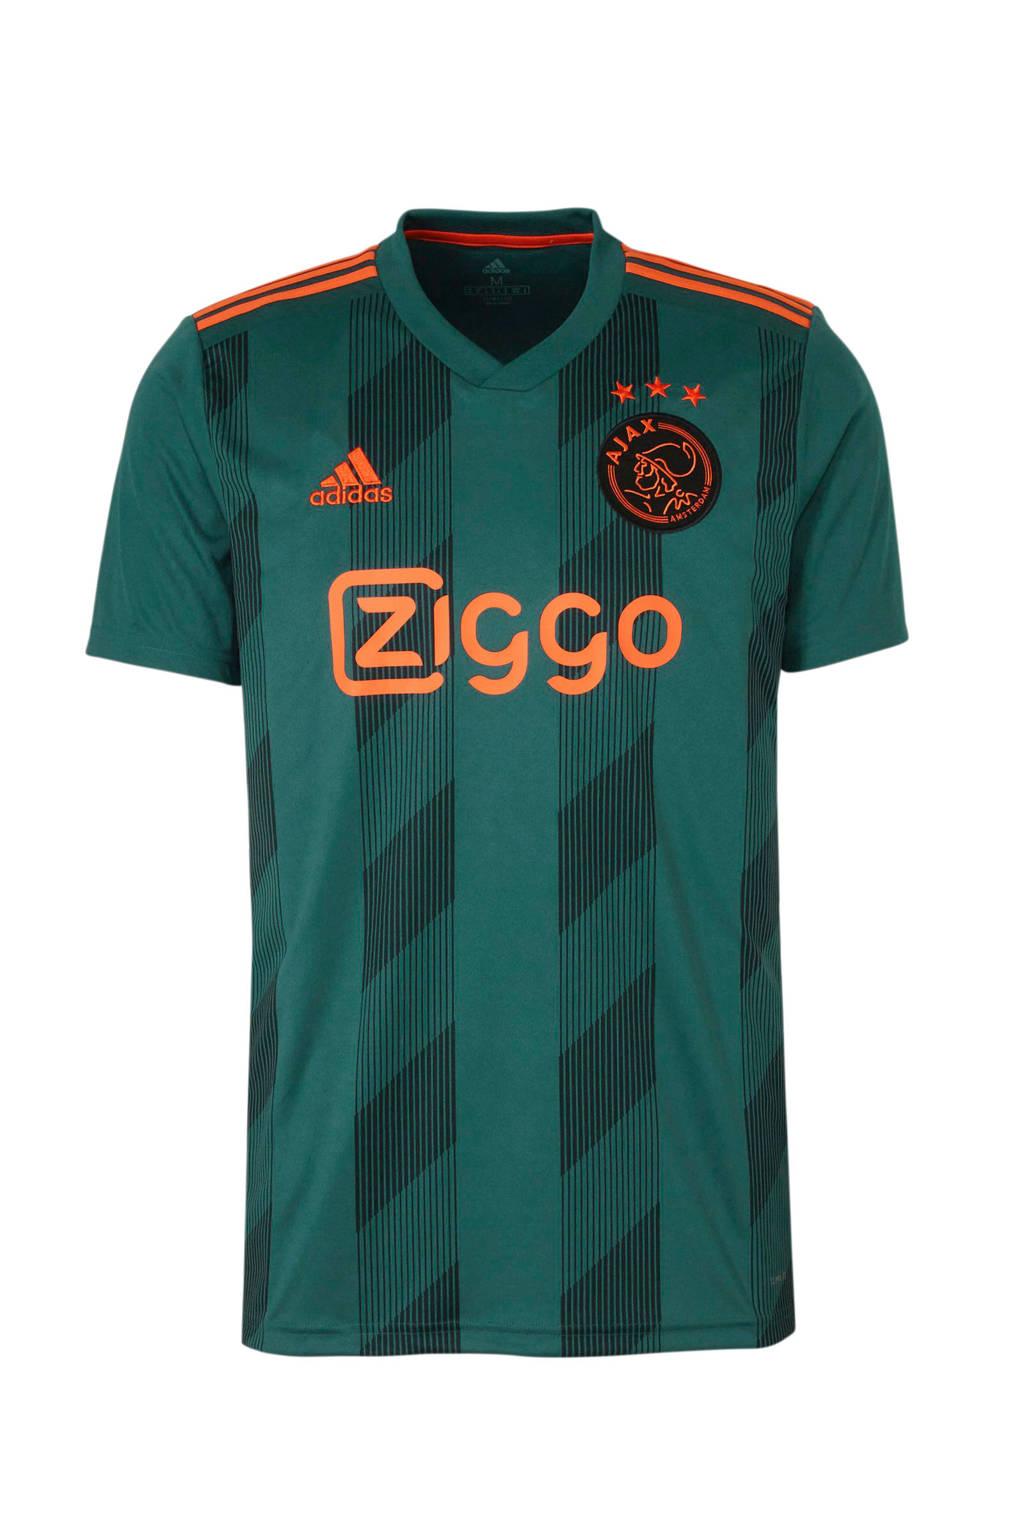 adidas performance Senior Ajax voetbalshirt Uit, Heren, Groen/zwart/oranje